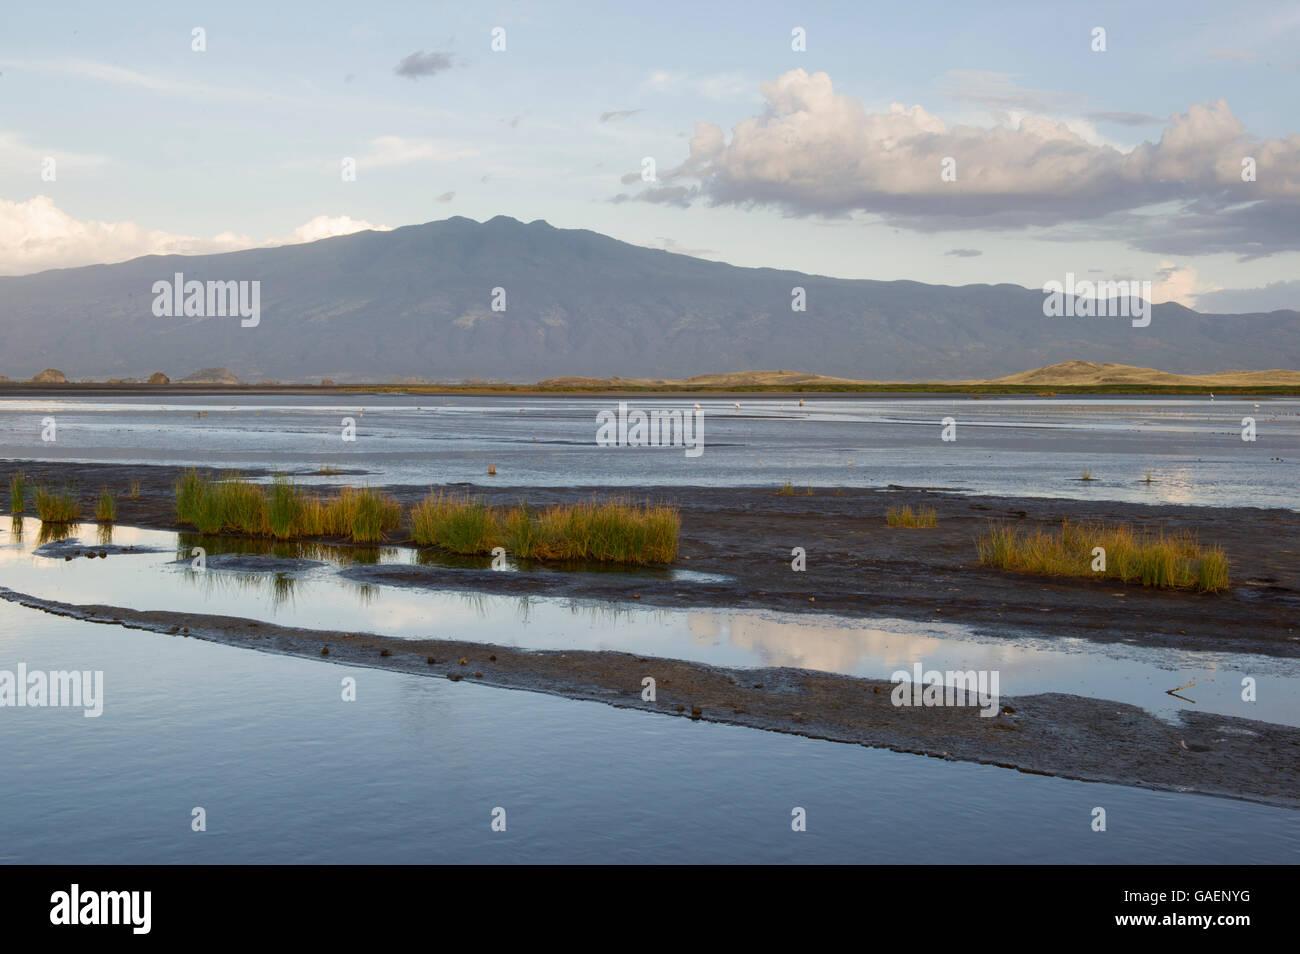 Lake Natron, Tanzania - Stock Image